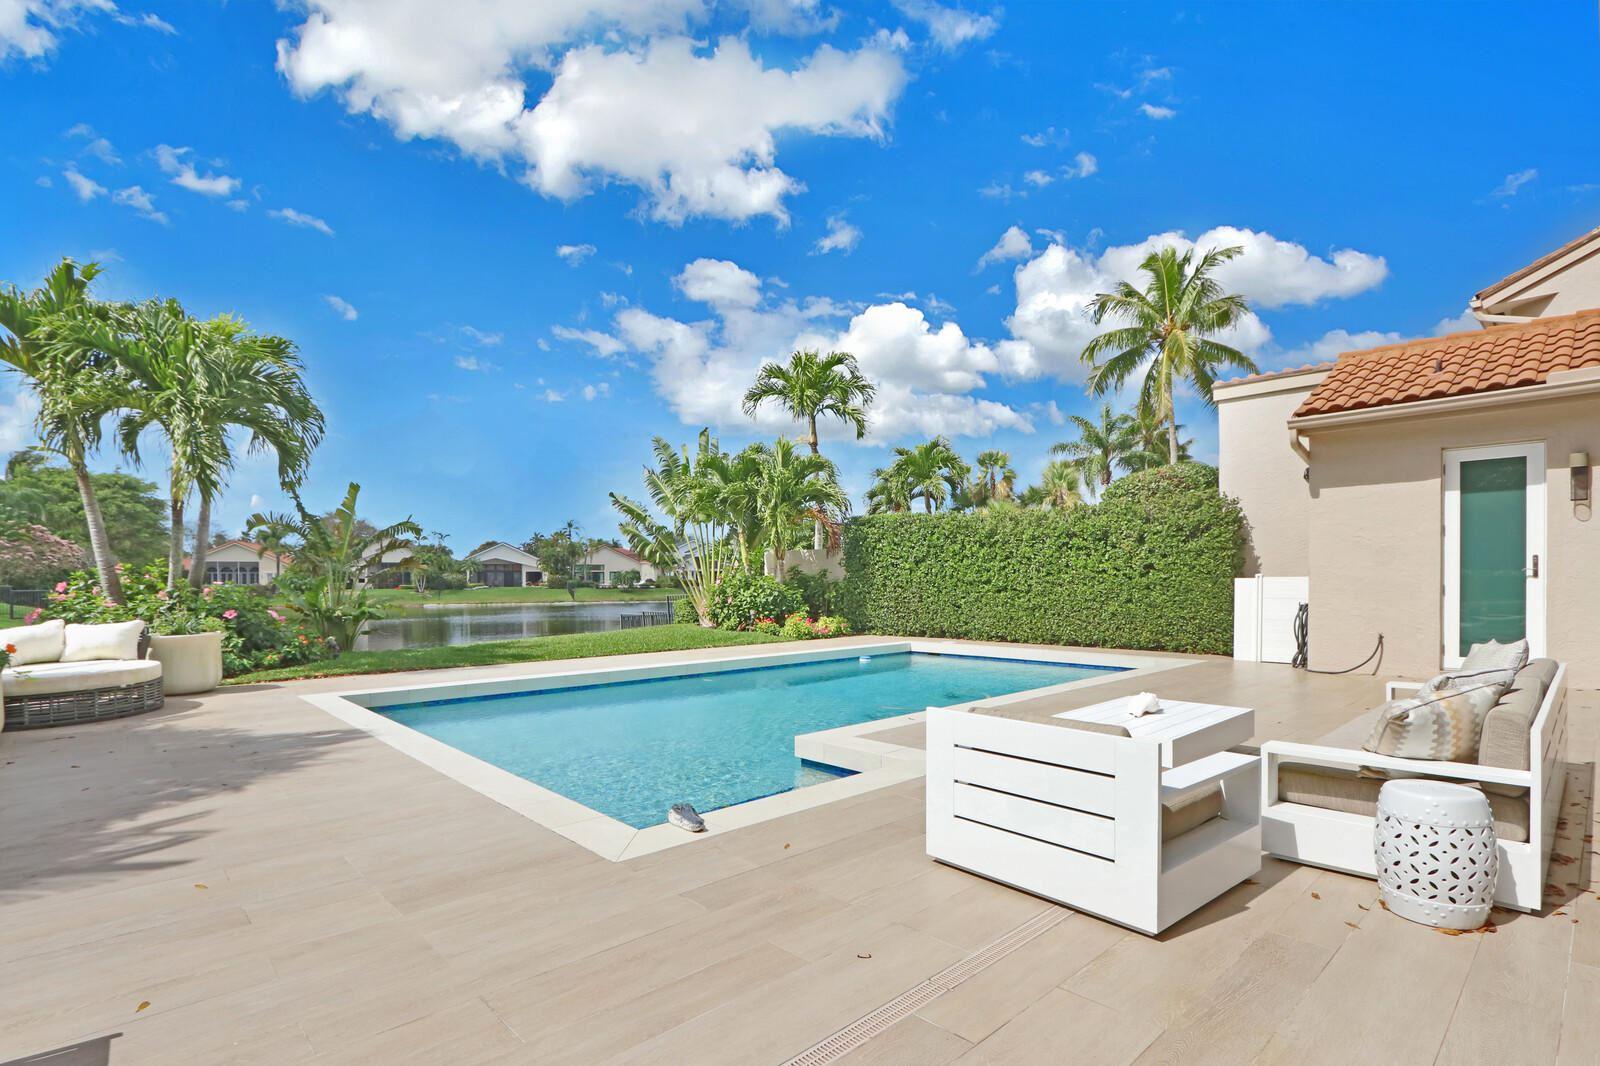 Photo of 13739 Parc Drive, Palm Beach Gardens, FL 33410 (MLS # RX-10695558)